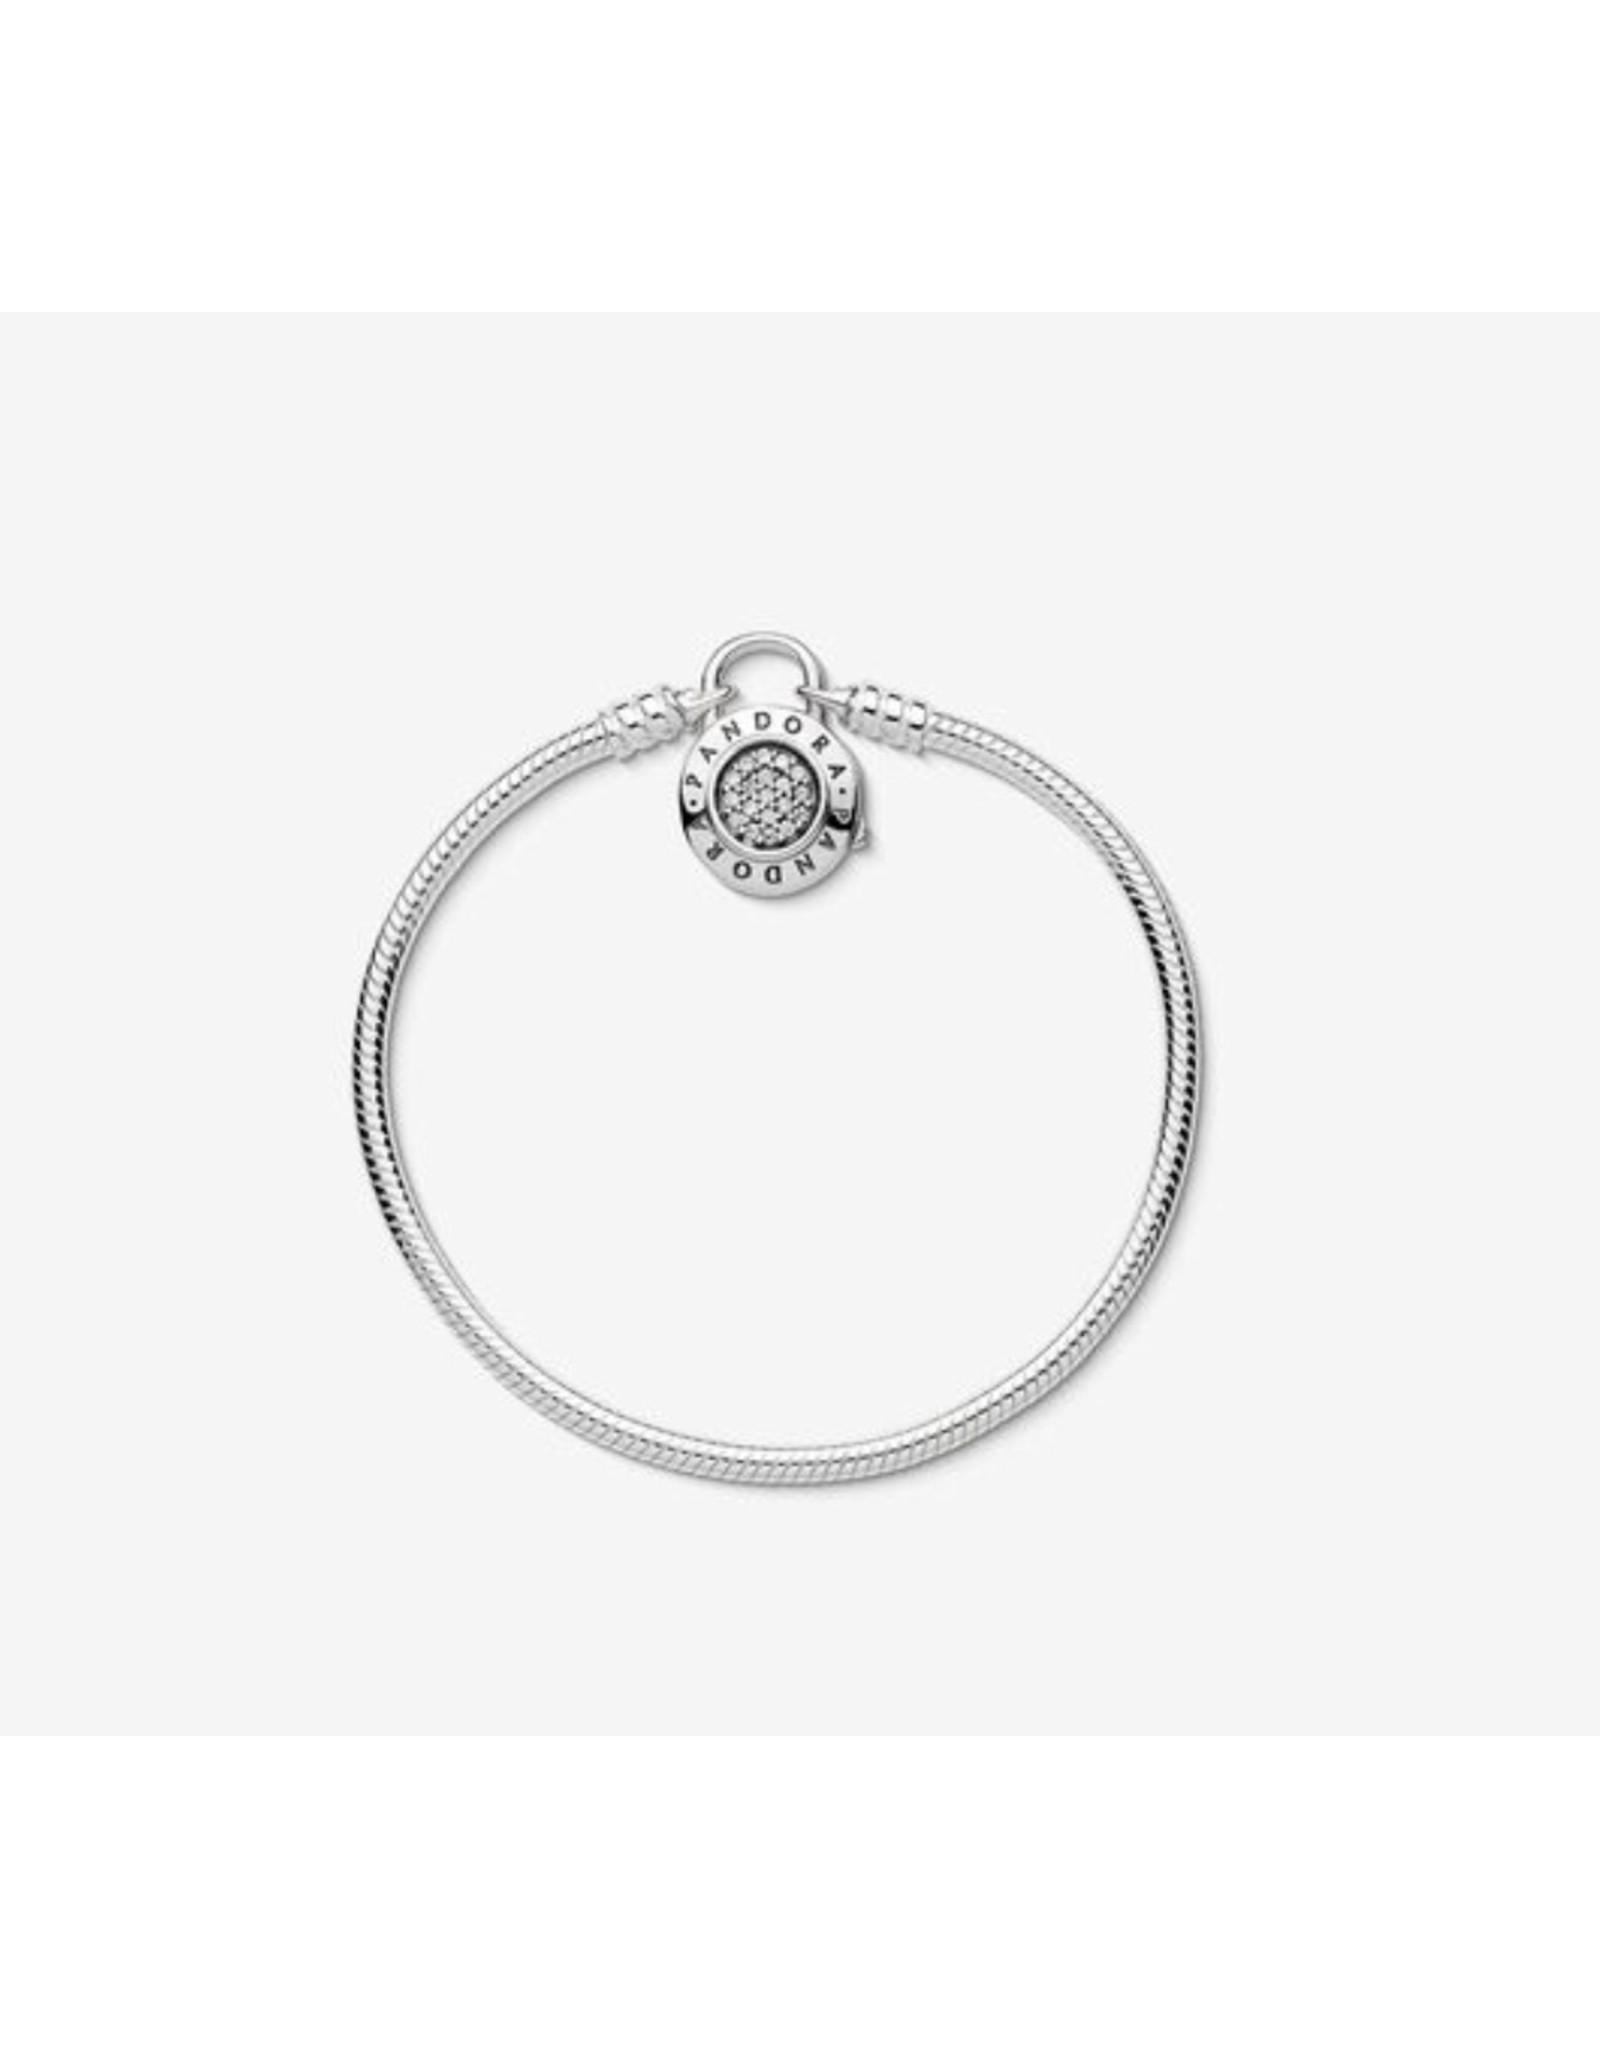 Pandora Pandora Bracelet,597092CZ,Pave and Padlock Clasp Snake Chain